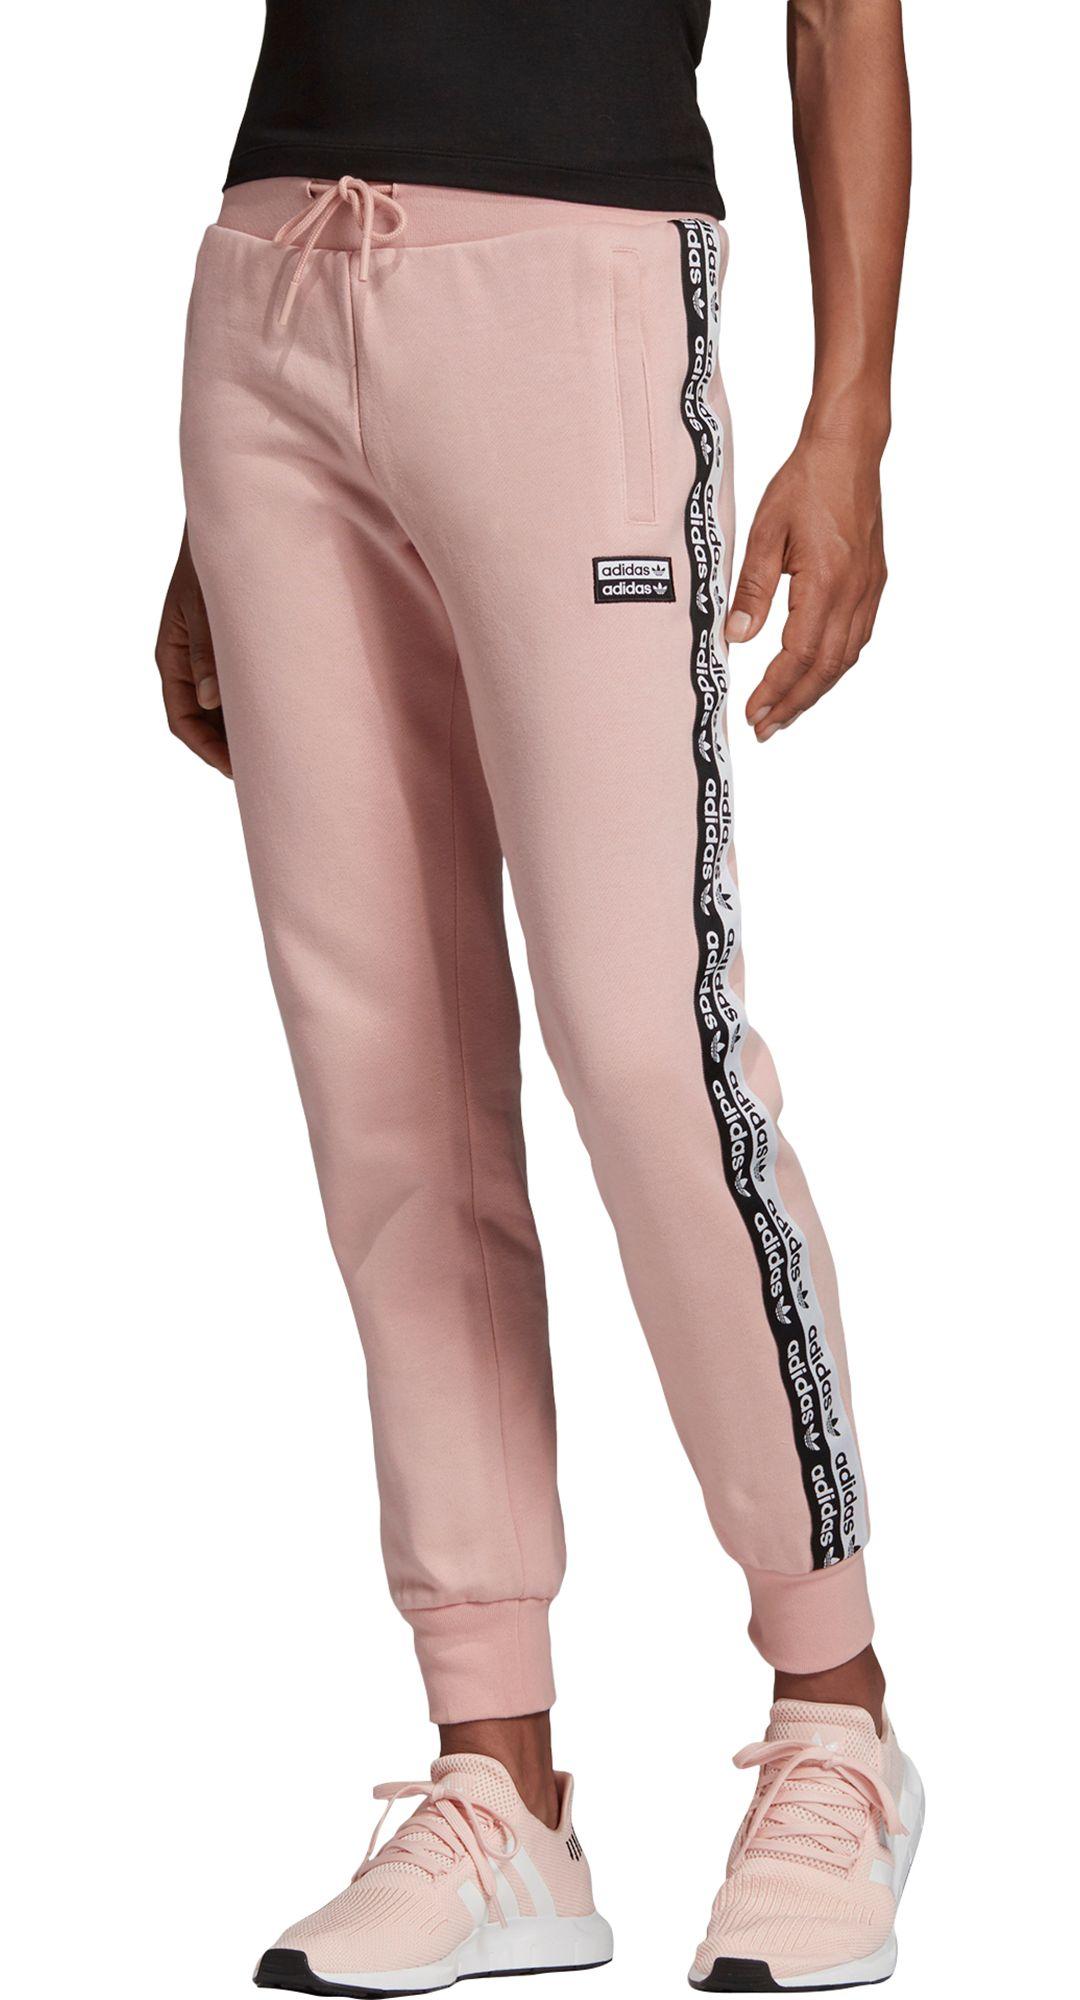 complete in specifications hottest sale temperament shoes Adidas Originals Women's Vocal Jogger Sweatpants